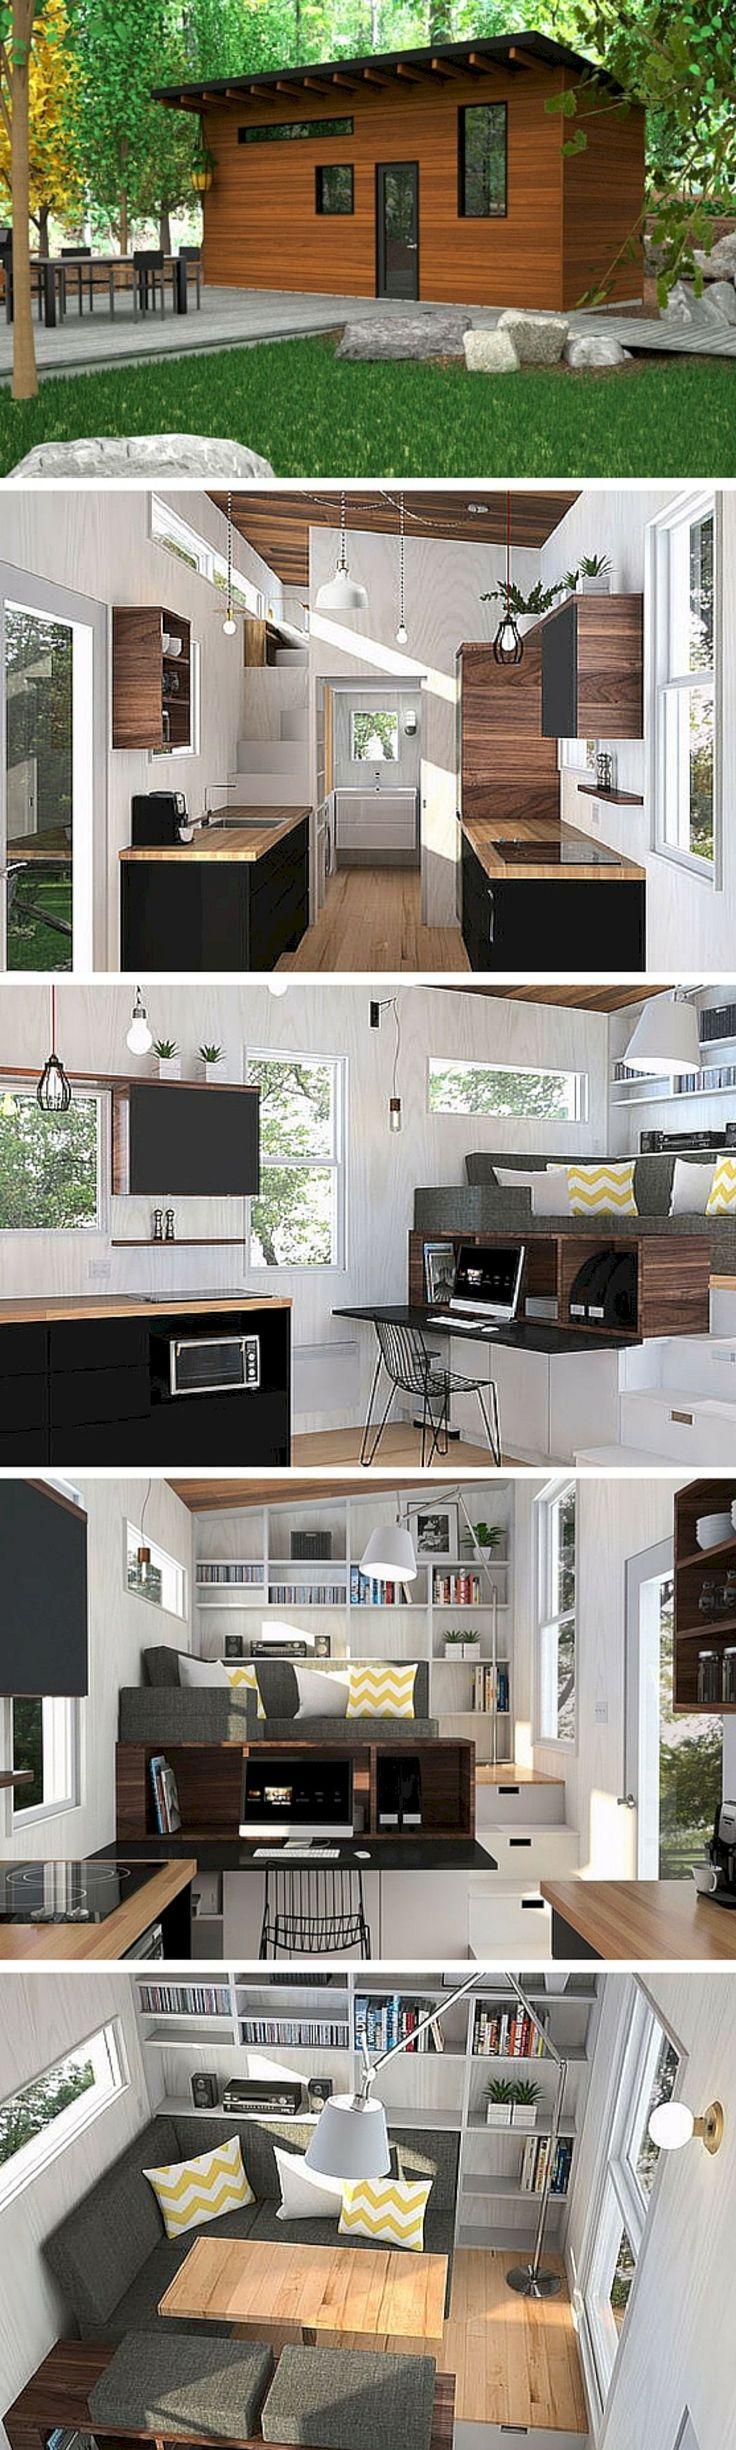 best tiny houseshome decor images on pinterest tiny house cabin